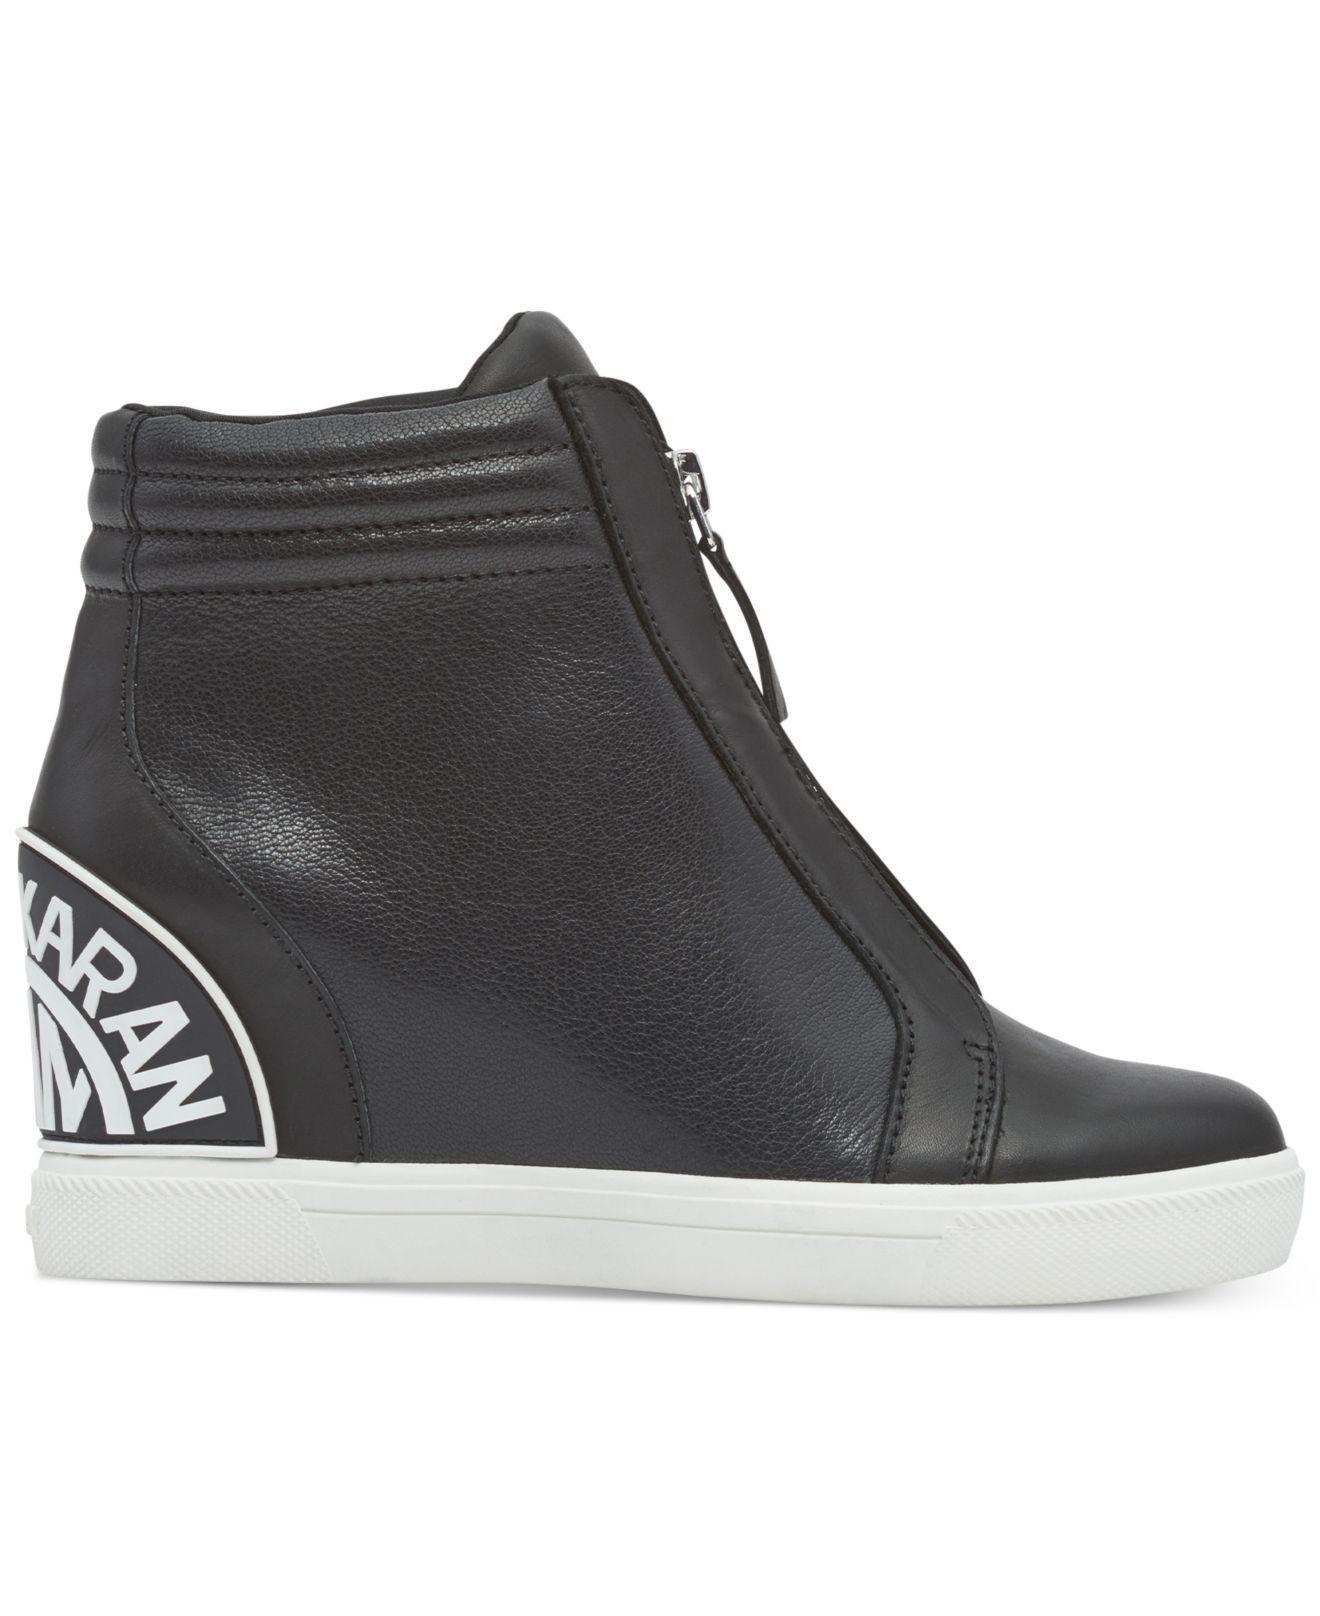 0c1eec17ffa DKNY - Black Connie Slip-on Wedge Sneakers, Created For Macy's - Lyst. View  fullscreen